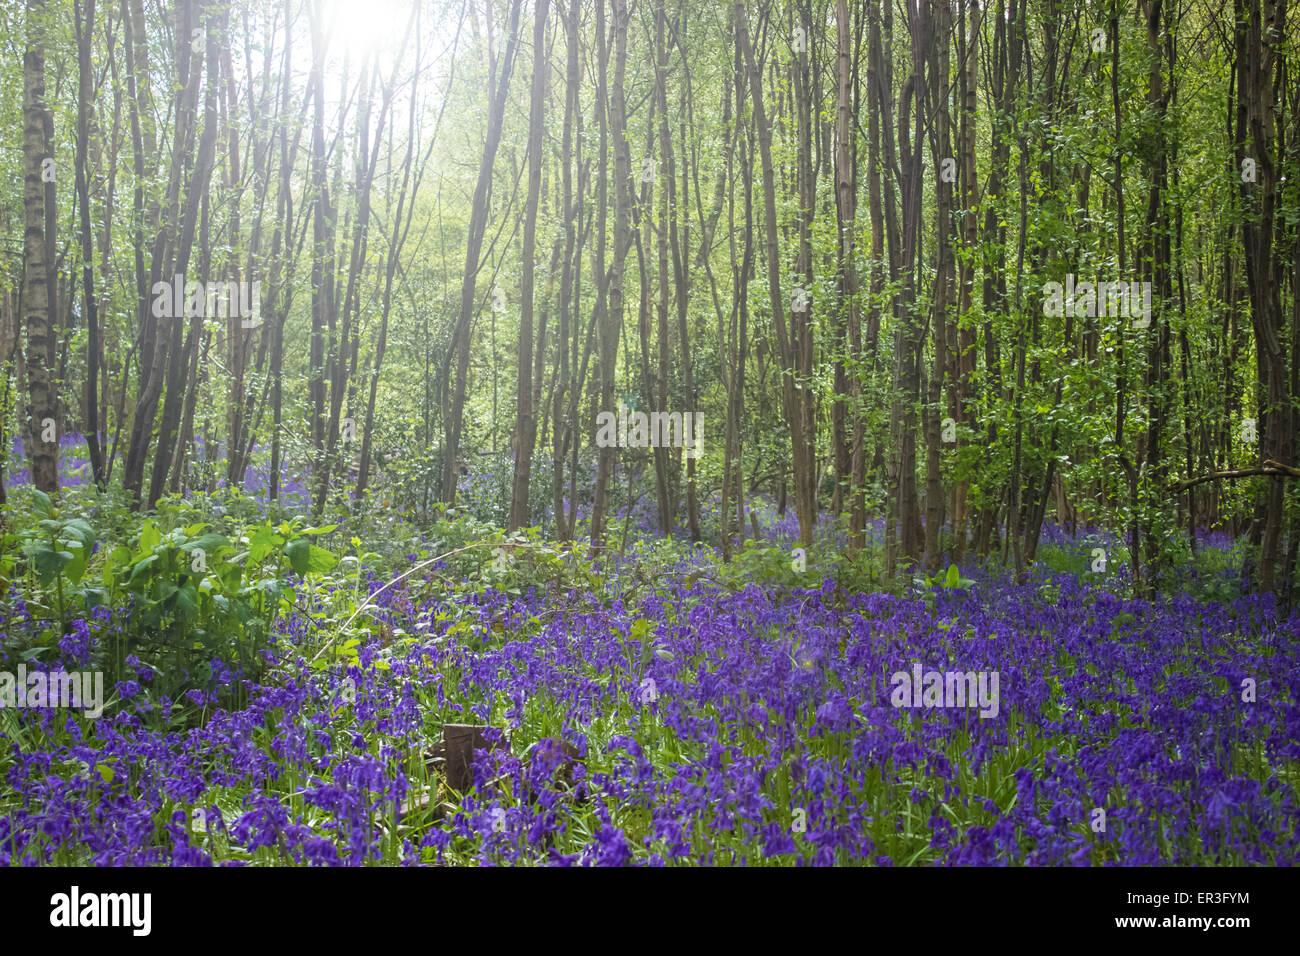 Bluebell Fields - Stock Image